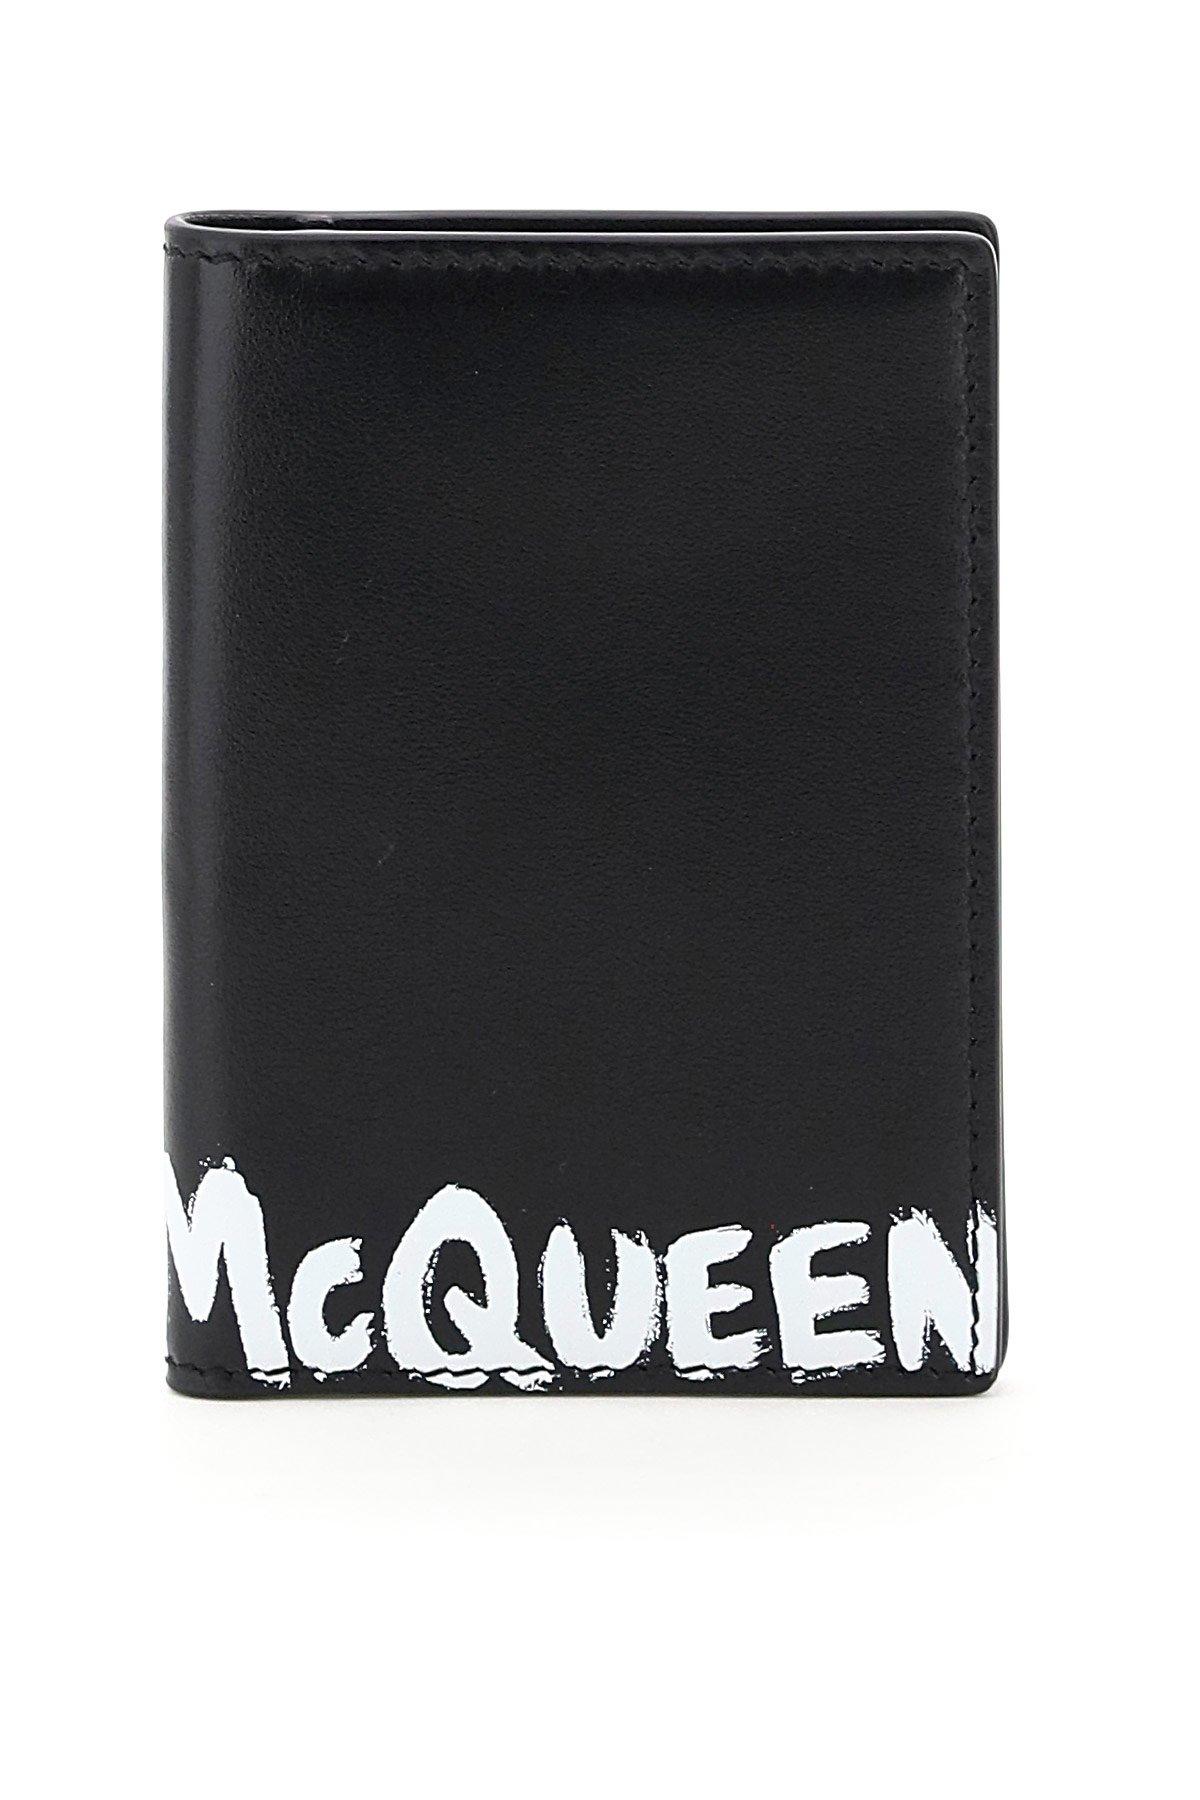 Alexander mcqueen portacarte bi-fold logo graffiti